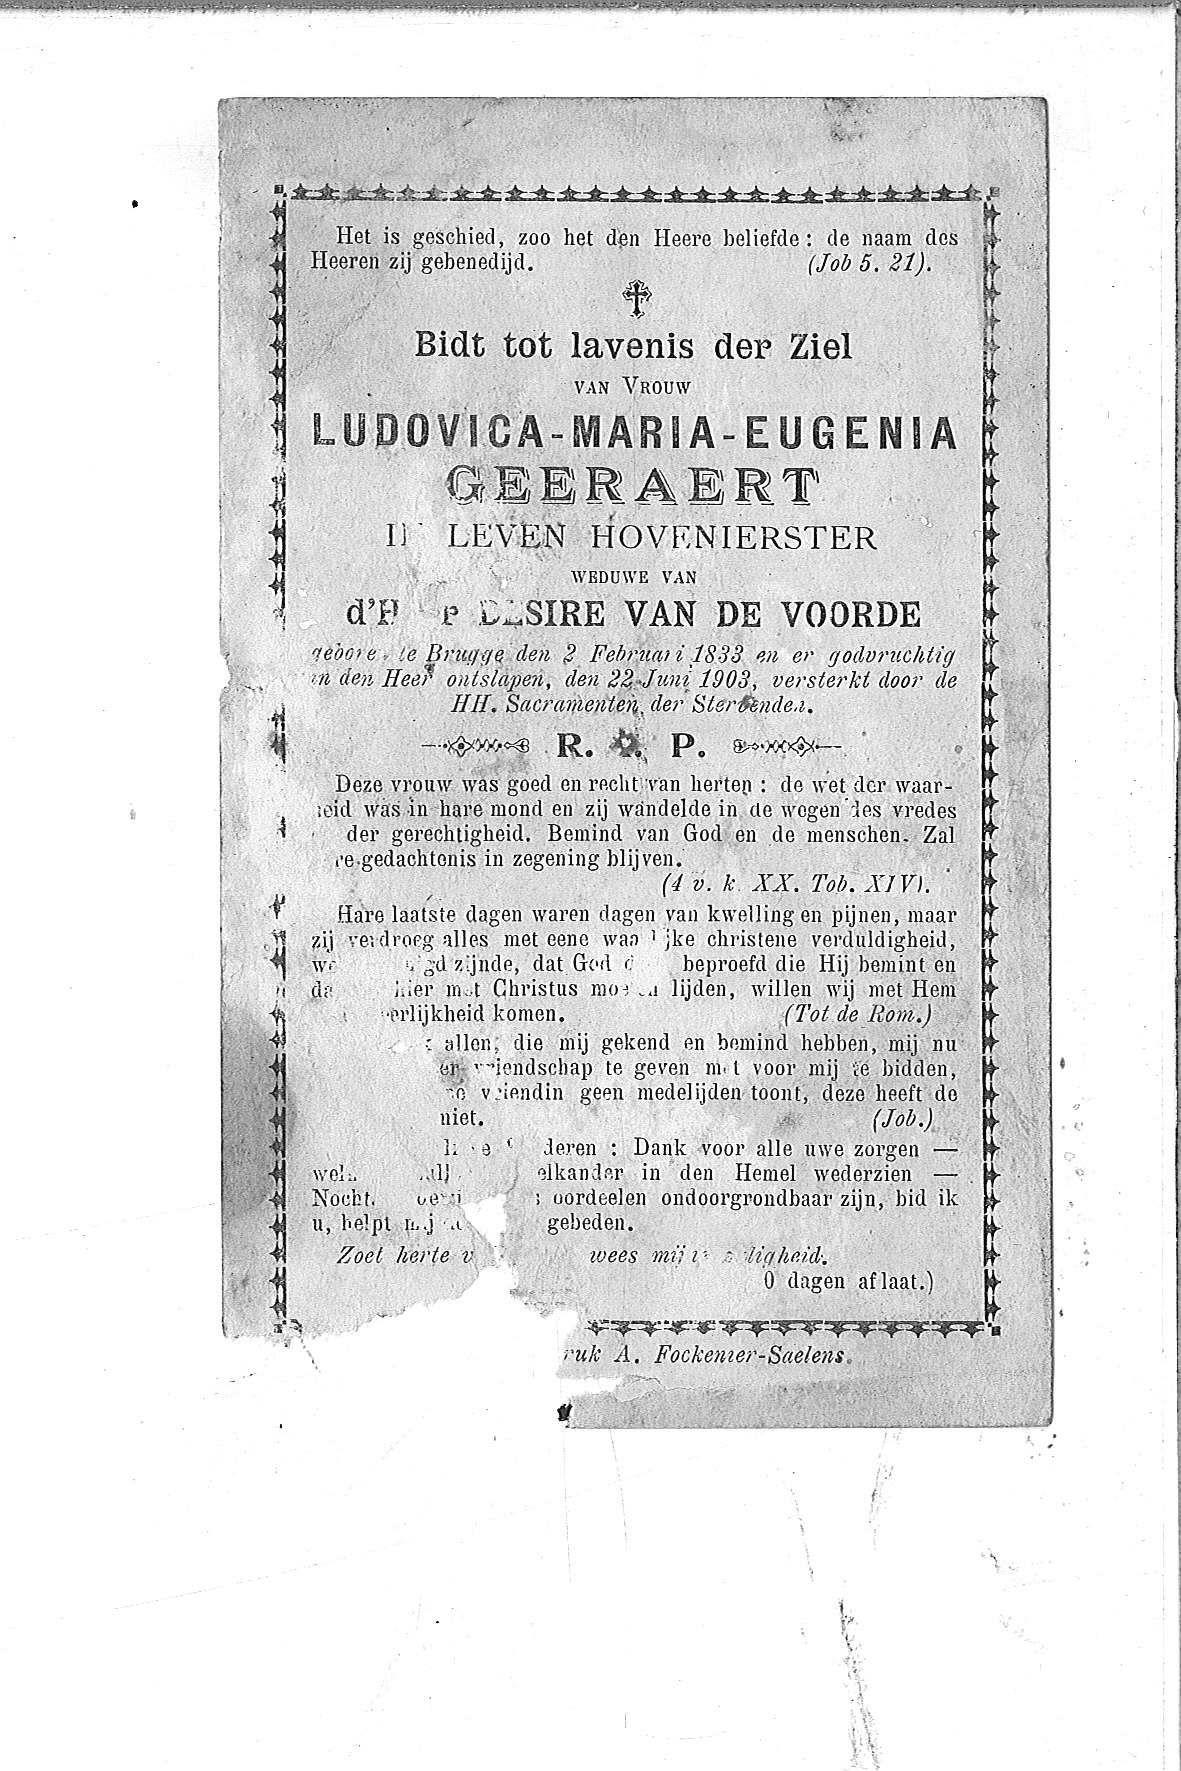 Ludovica-Maria-Eugenia(1903)20130822140146_00005.jpg